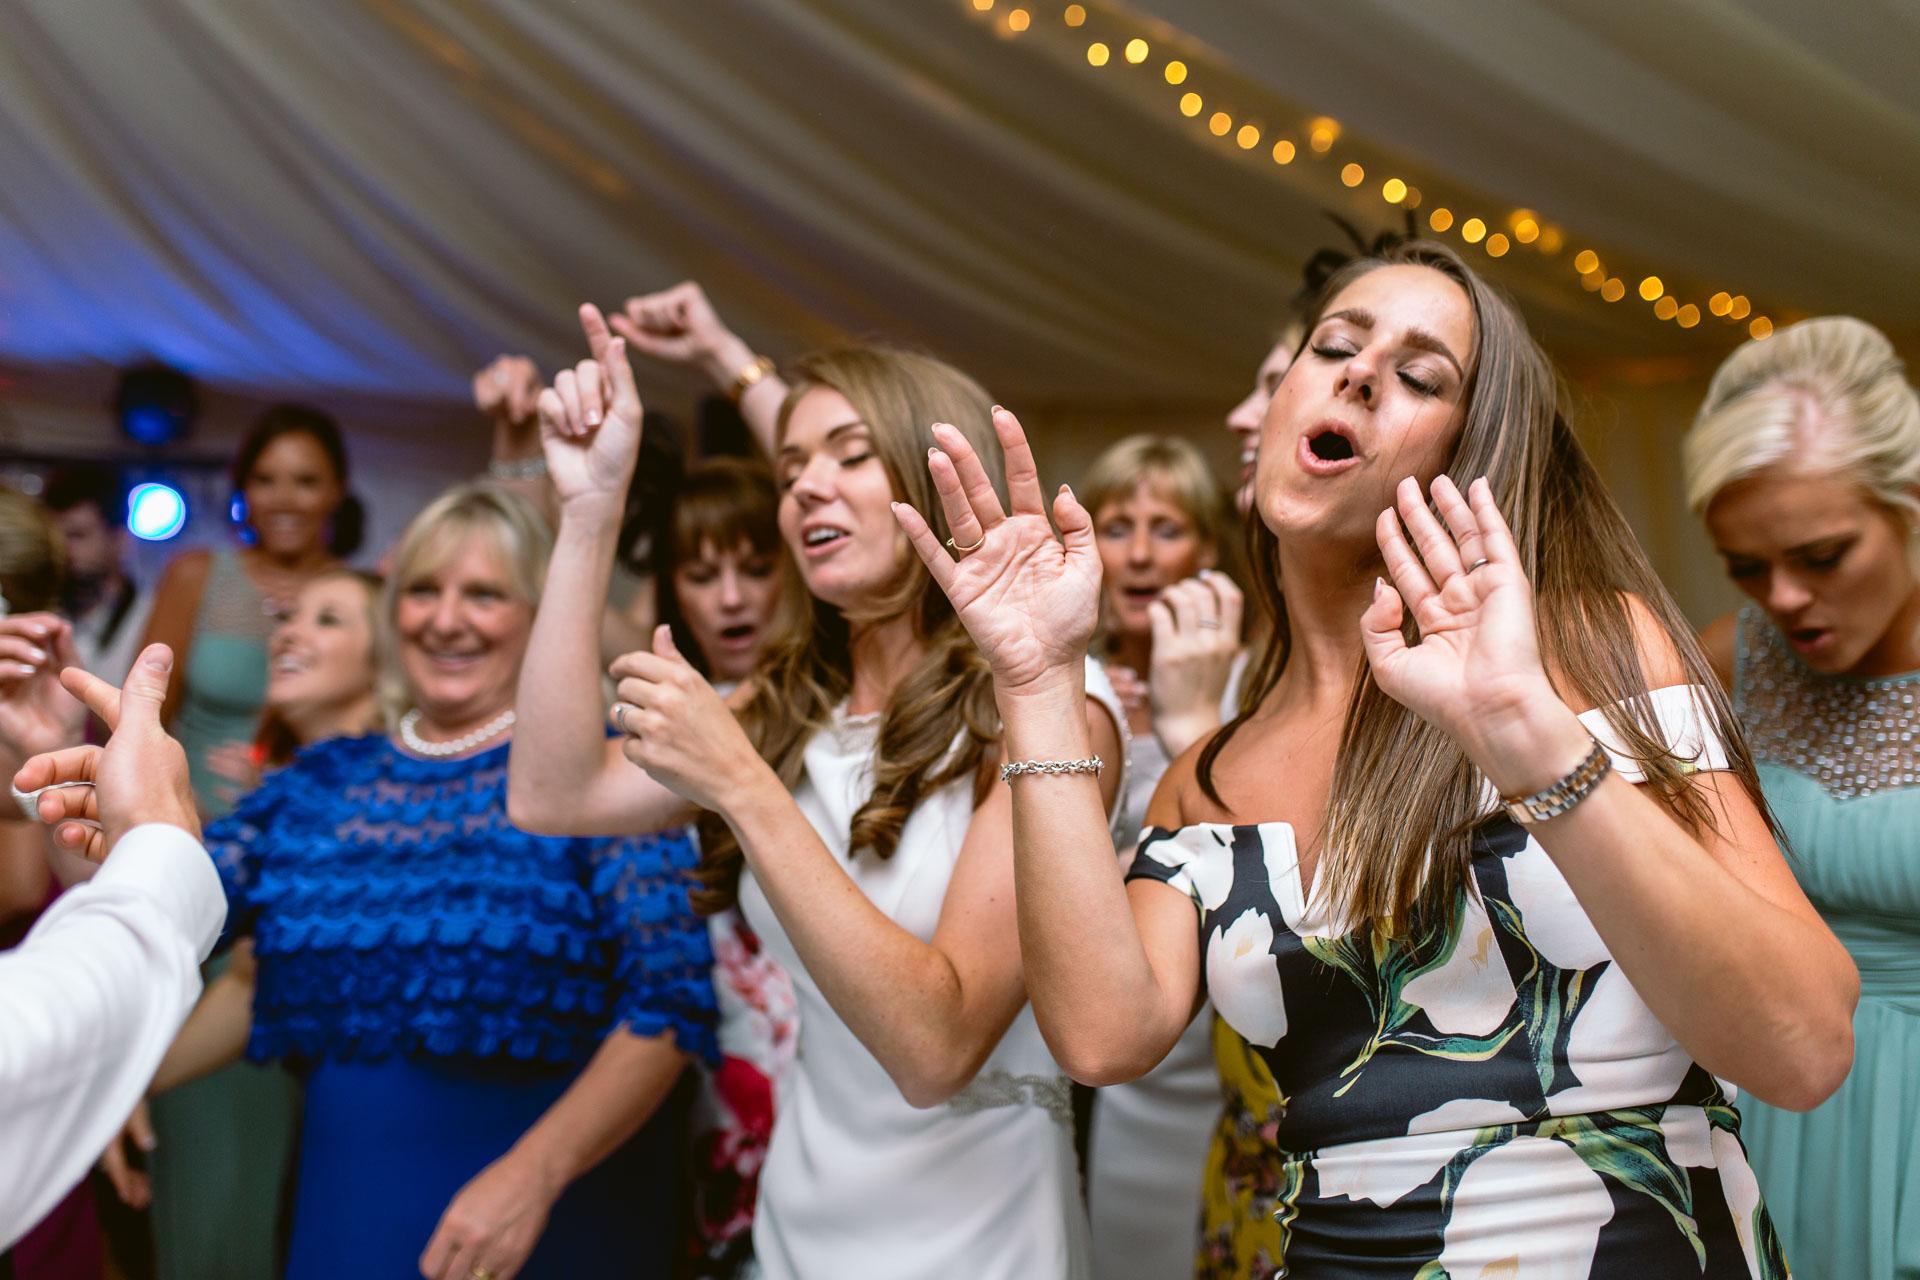 The Citadel wedding Shropshire Sarah-Jane and Steve wedding guests dancing crazy on the dance floor